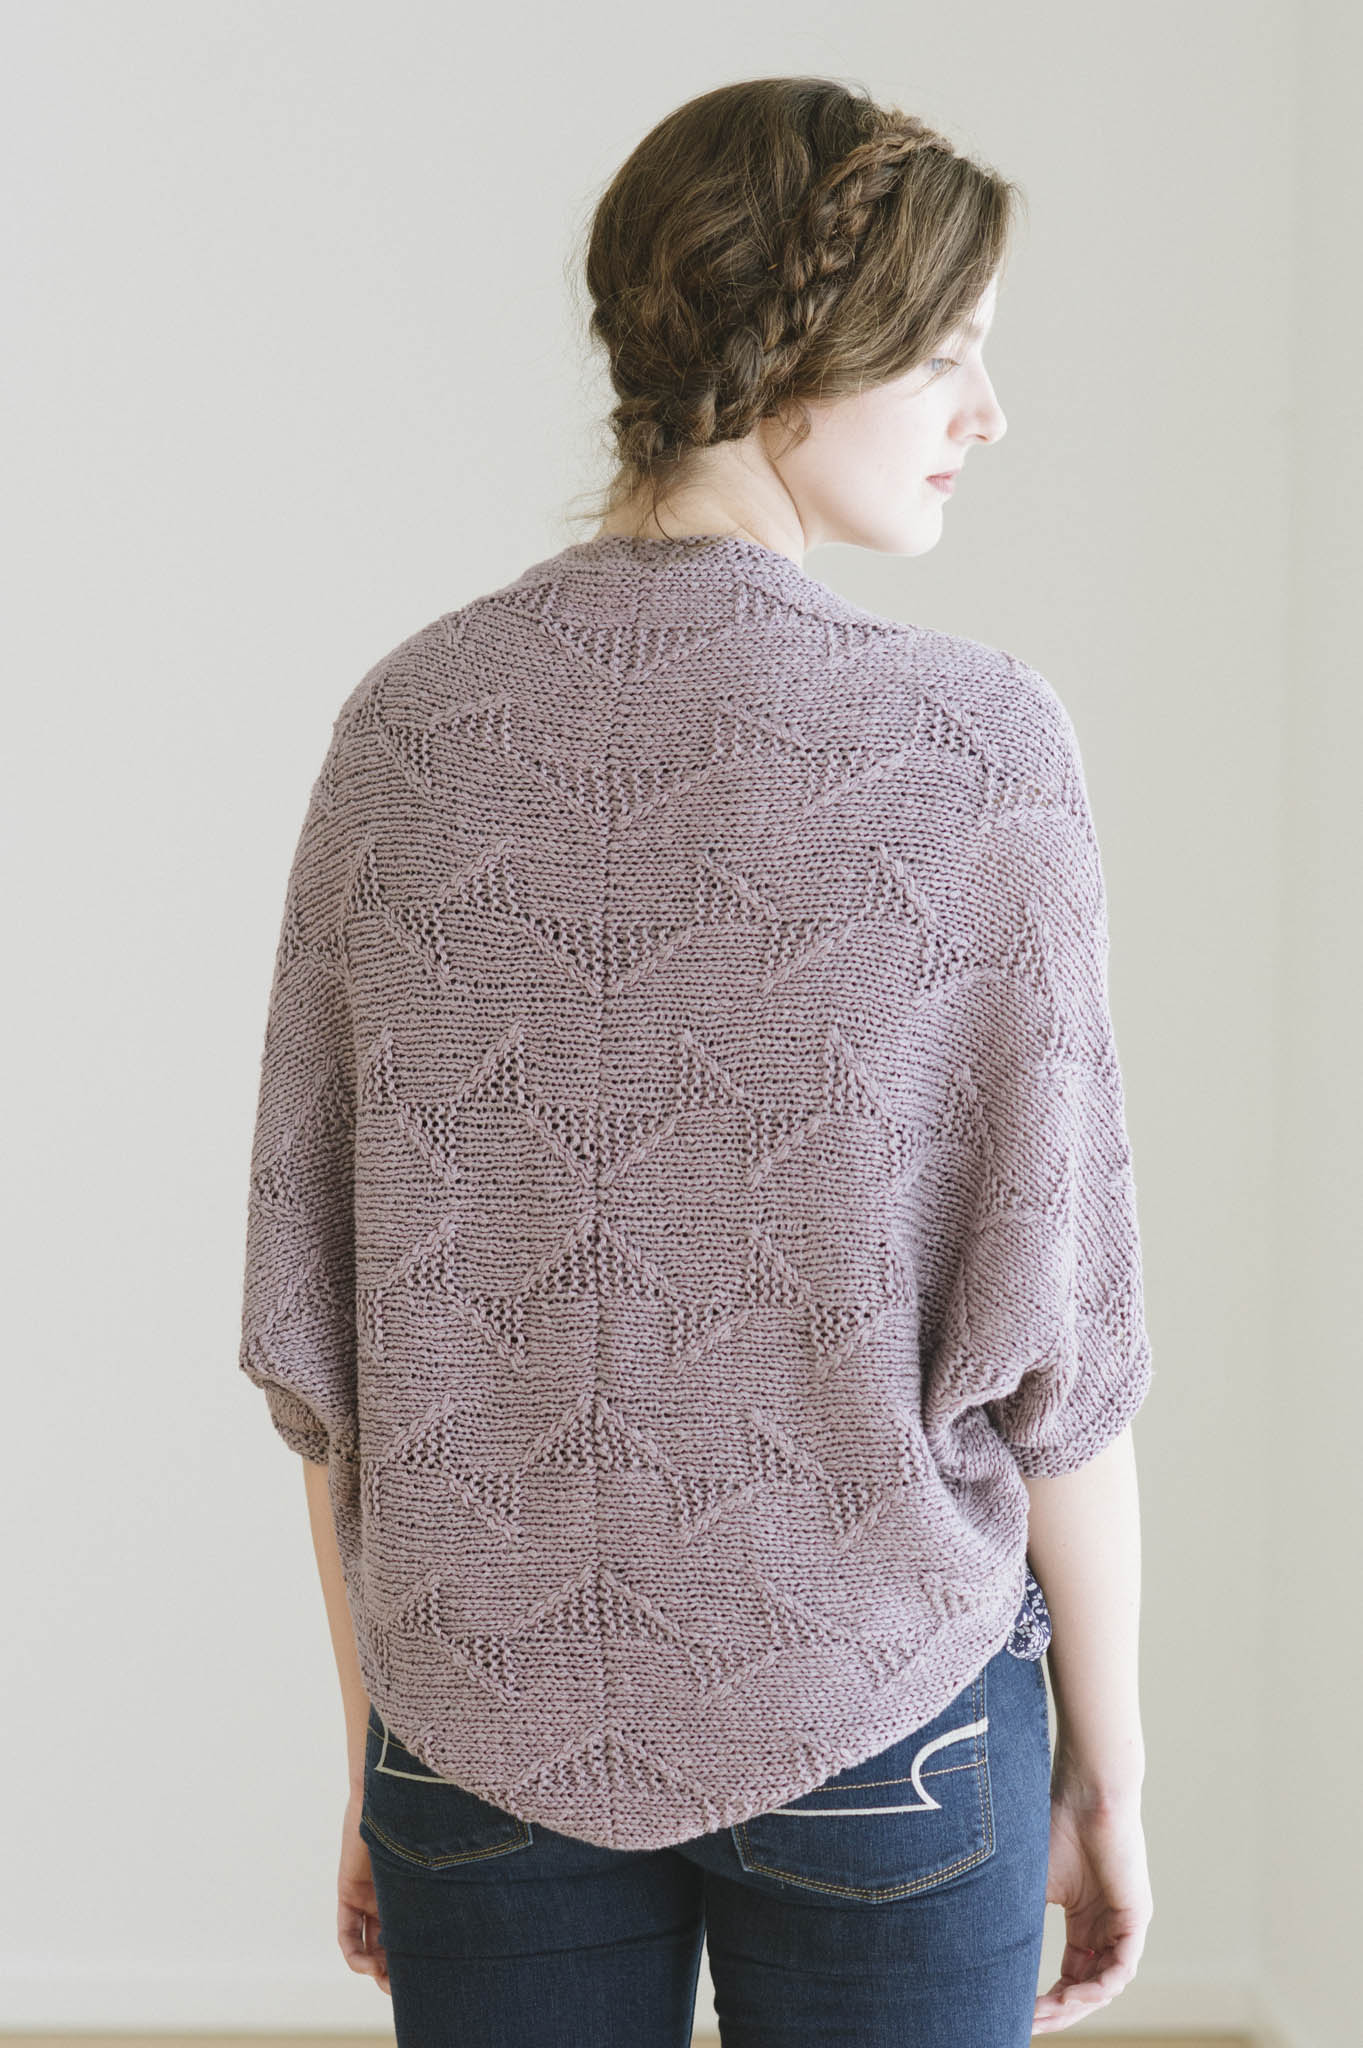 quince-co-bridie-bristol-ivy-knitting-pattern-kestrel-3.jpg